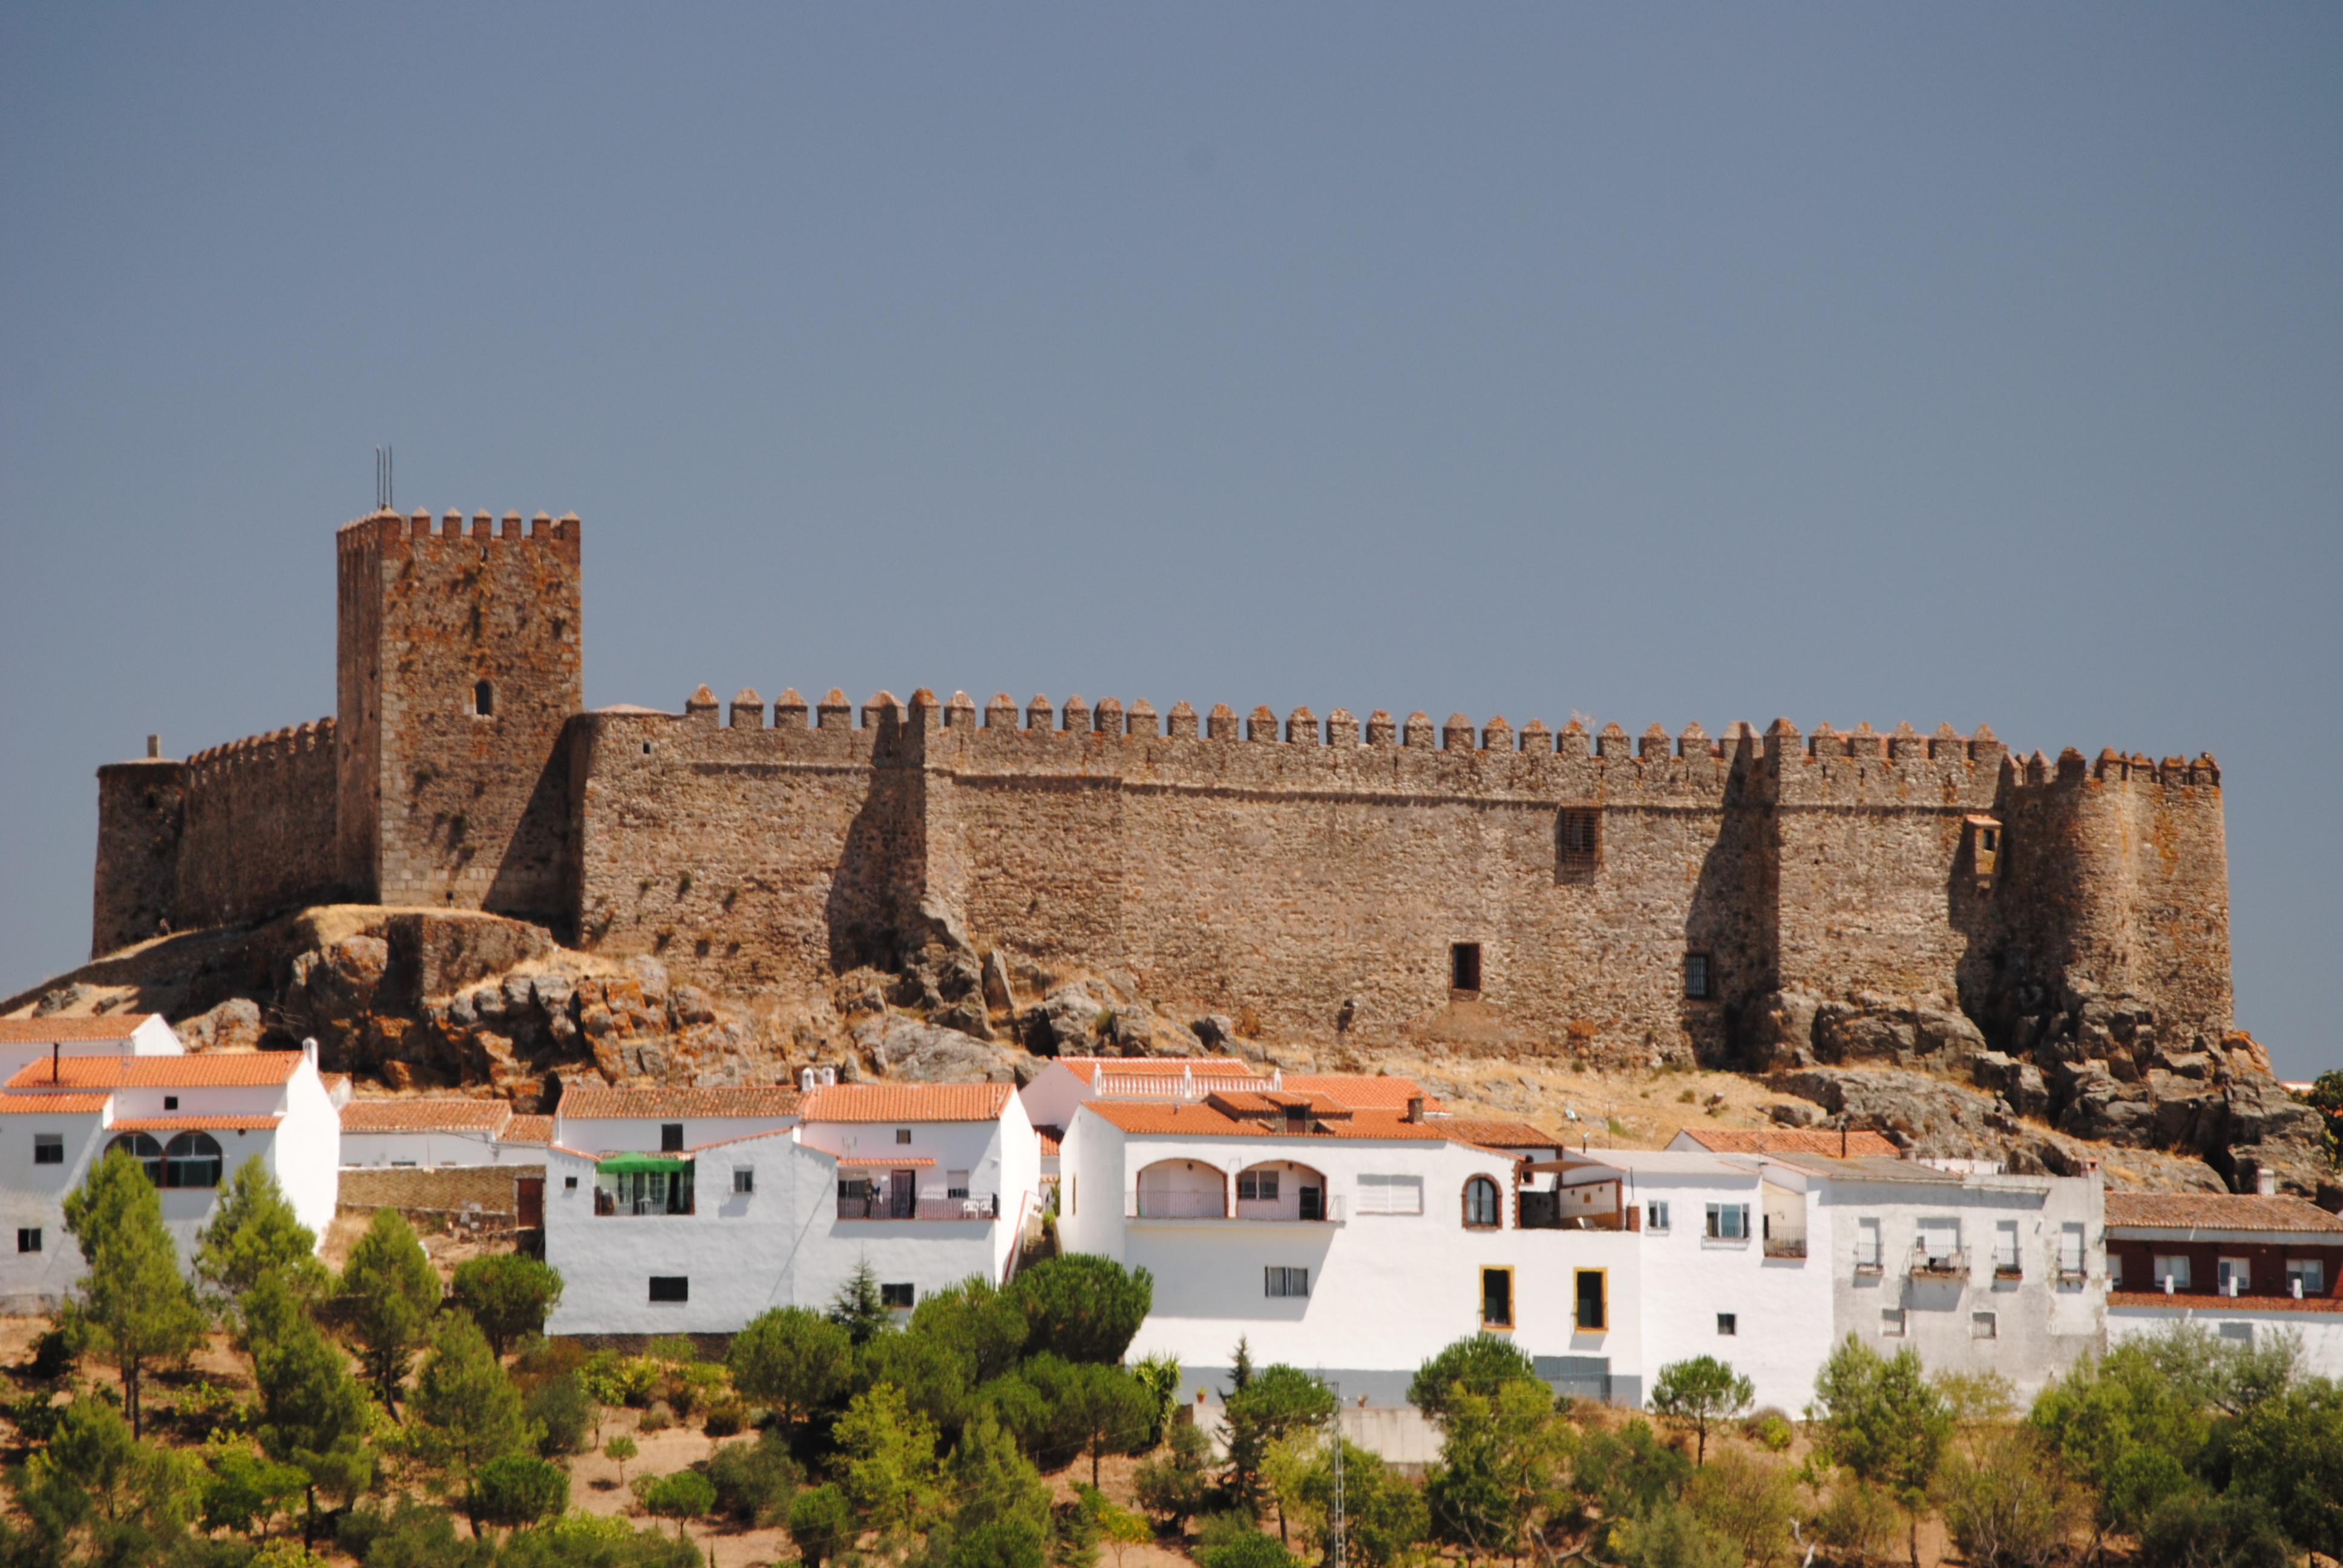 File:Castillo de Segura de León (15006188472).jpg - Wikimedia Commons